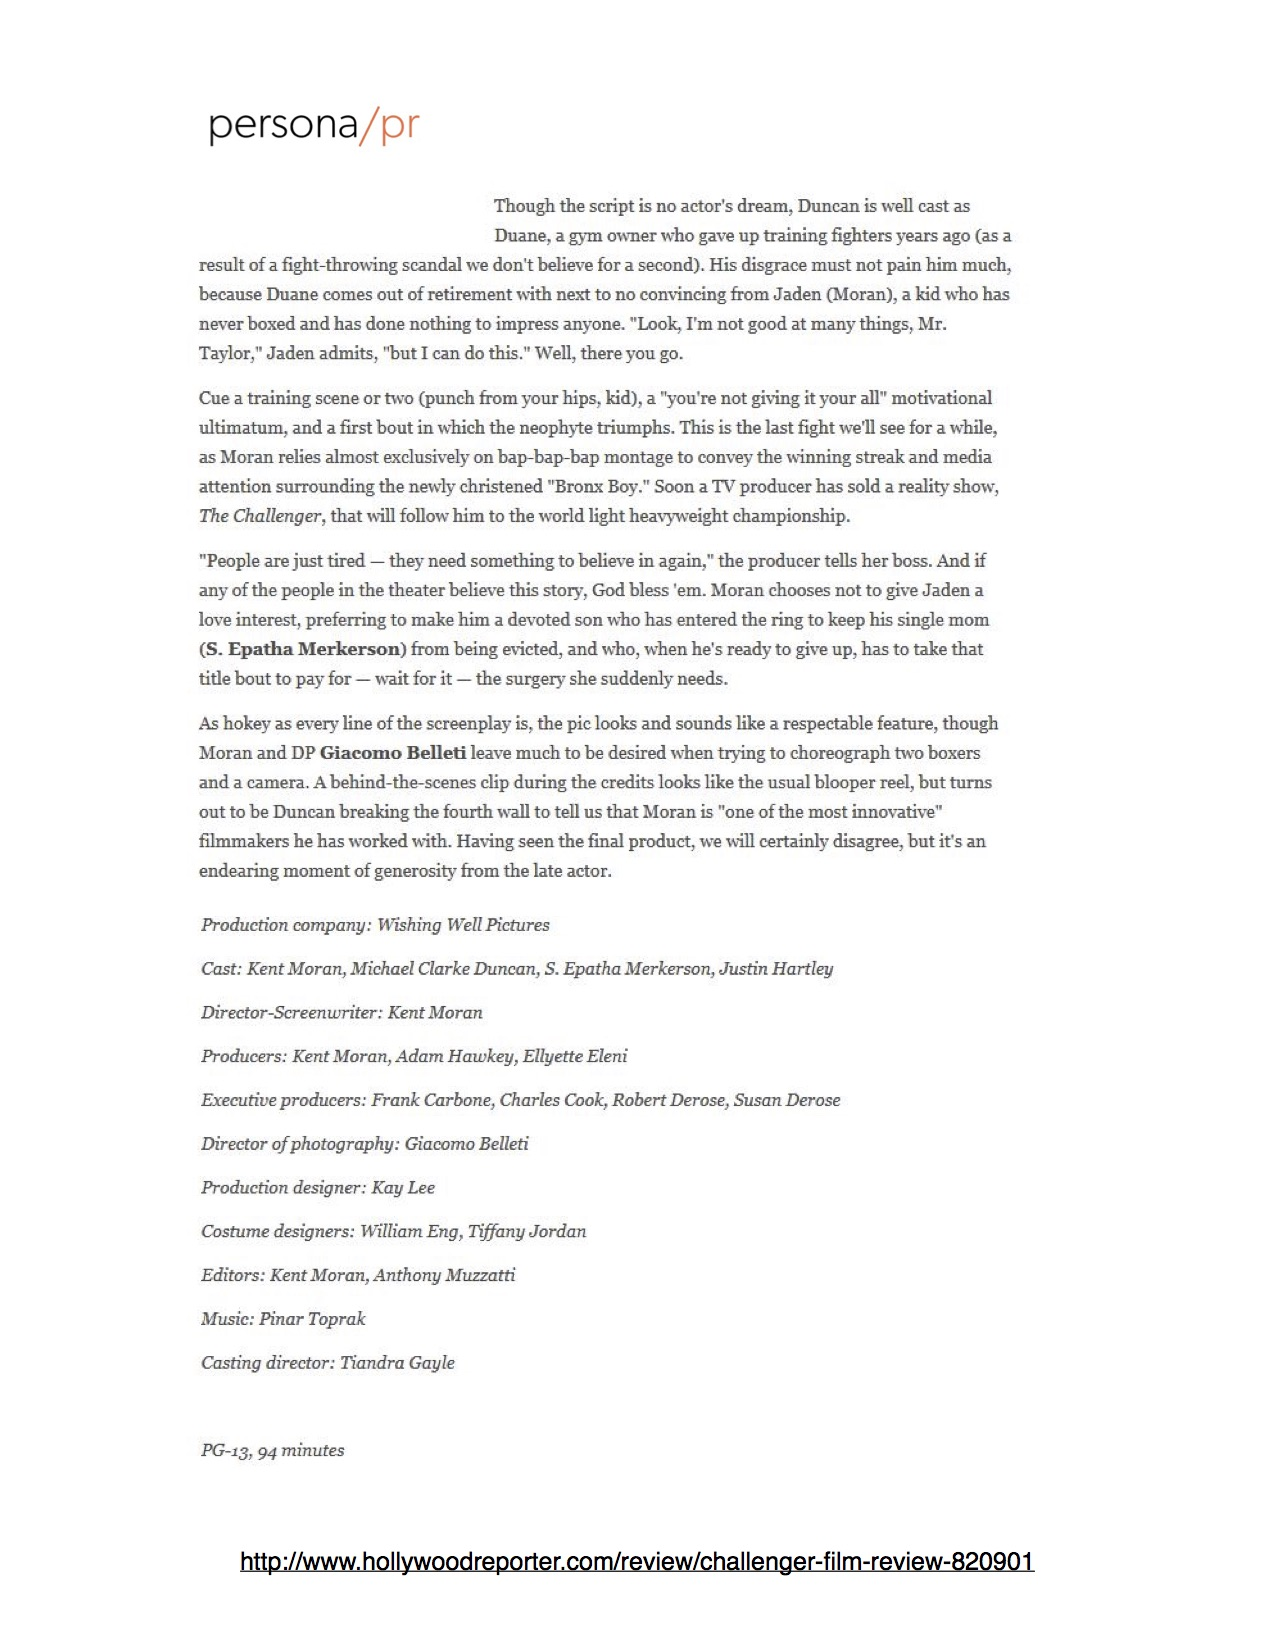 12b KentMoran-HollywoodReporter.com-9.8.15.jpg